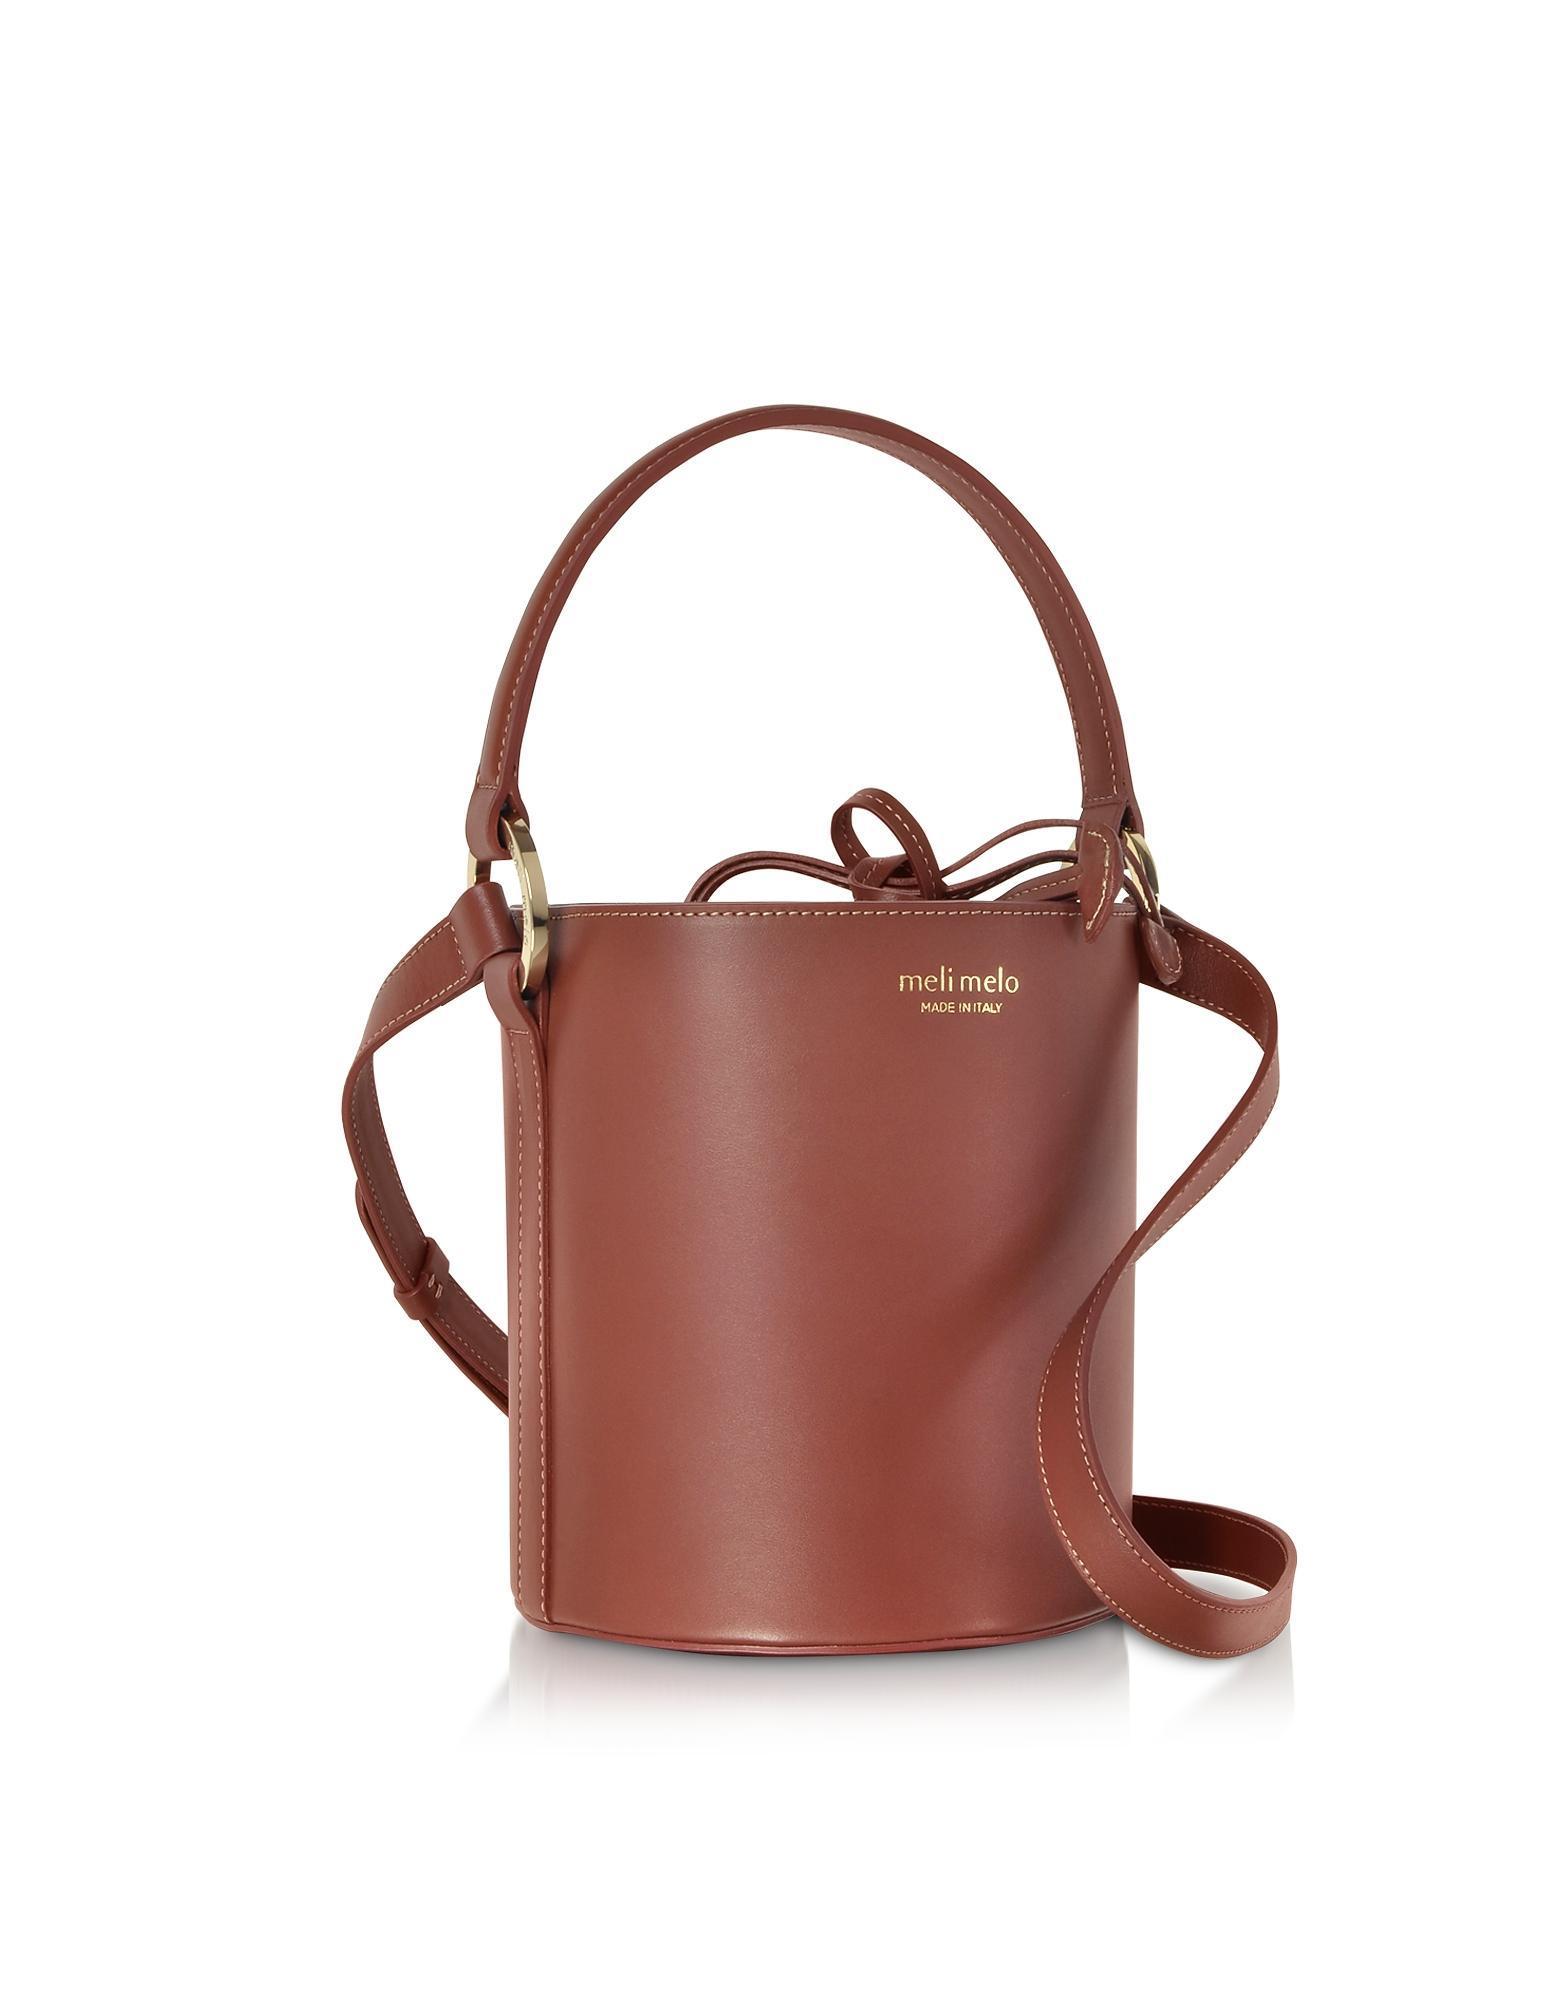 Lyst - Meli Melo Argan Nappa Leather Santina Mini Bucket Bag in Brown 907c7a45782d2